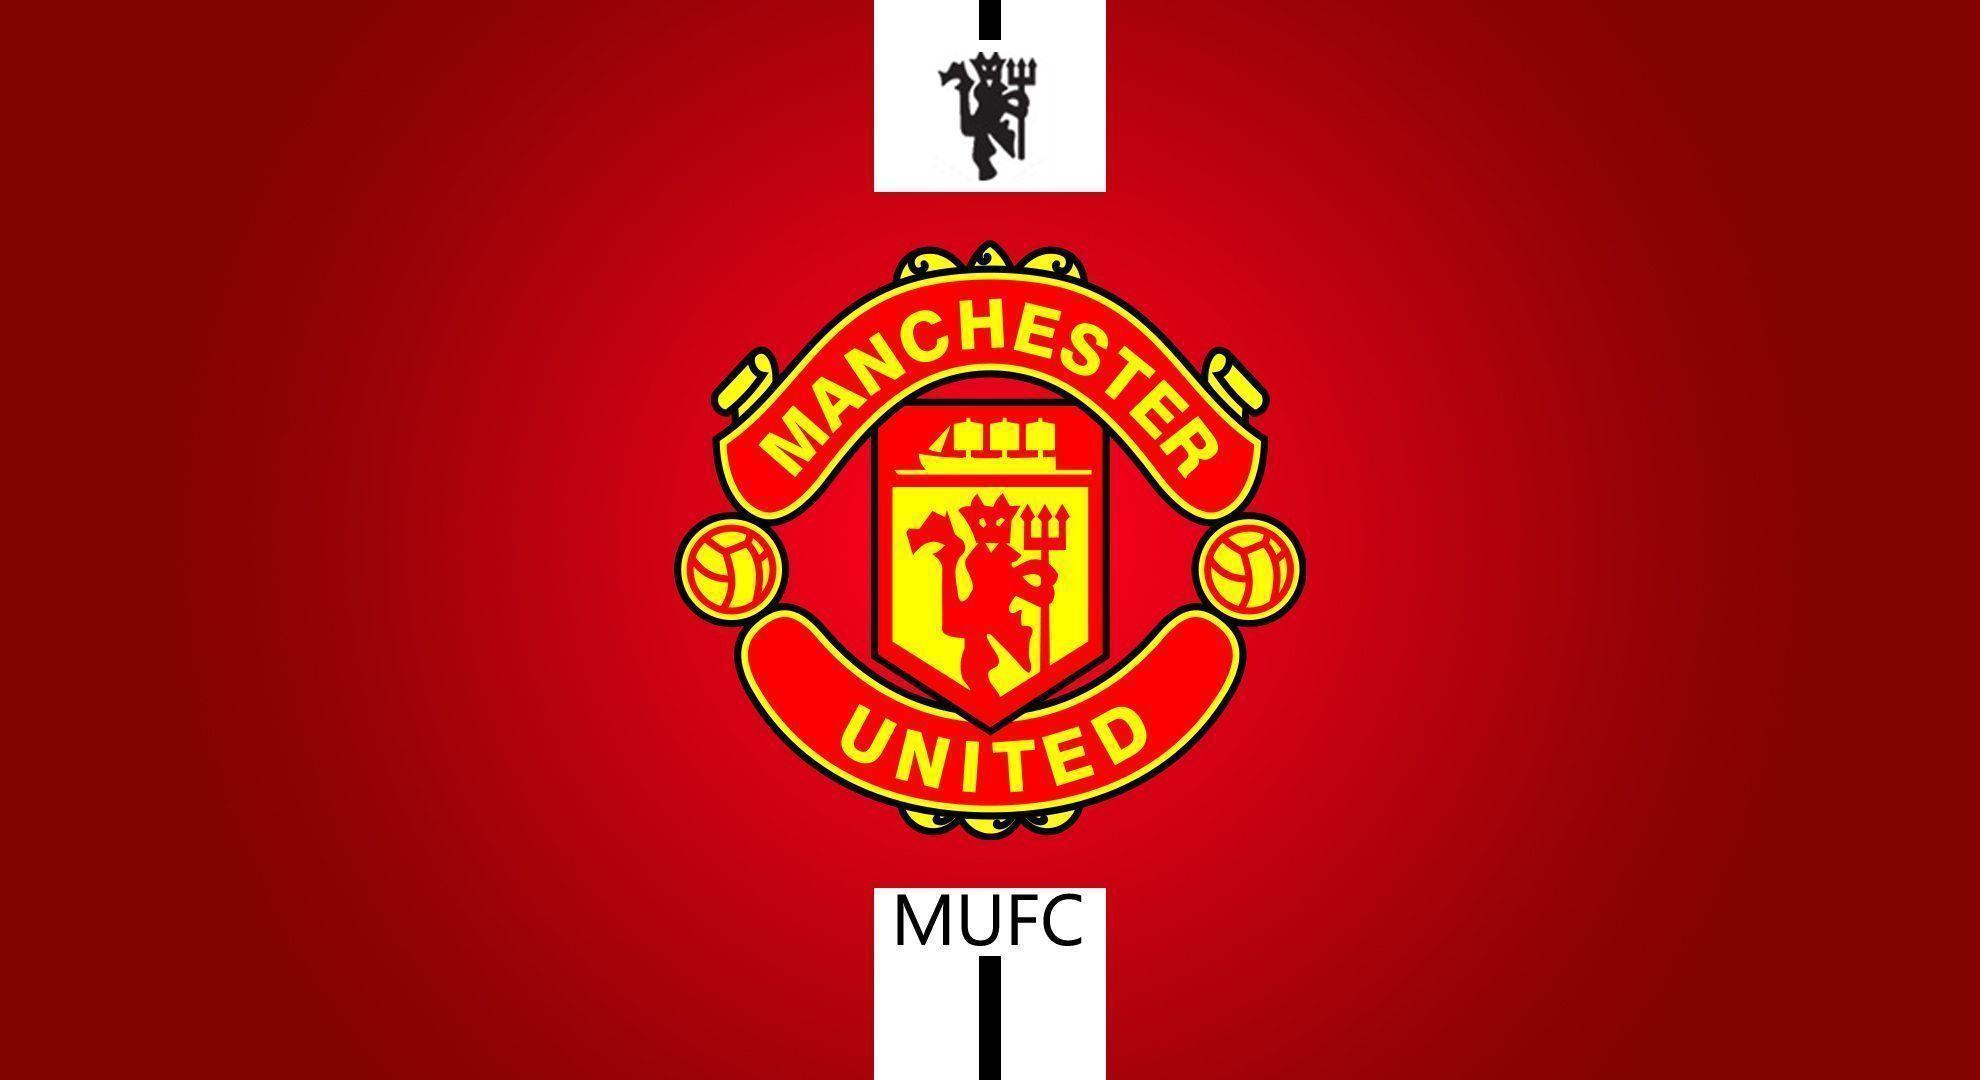 77 ] Manchester United Wallpaper On WallpaperSafari